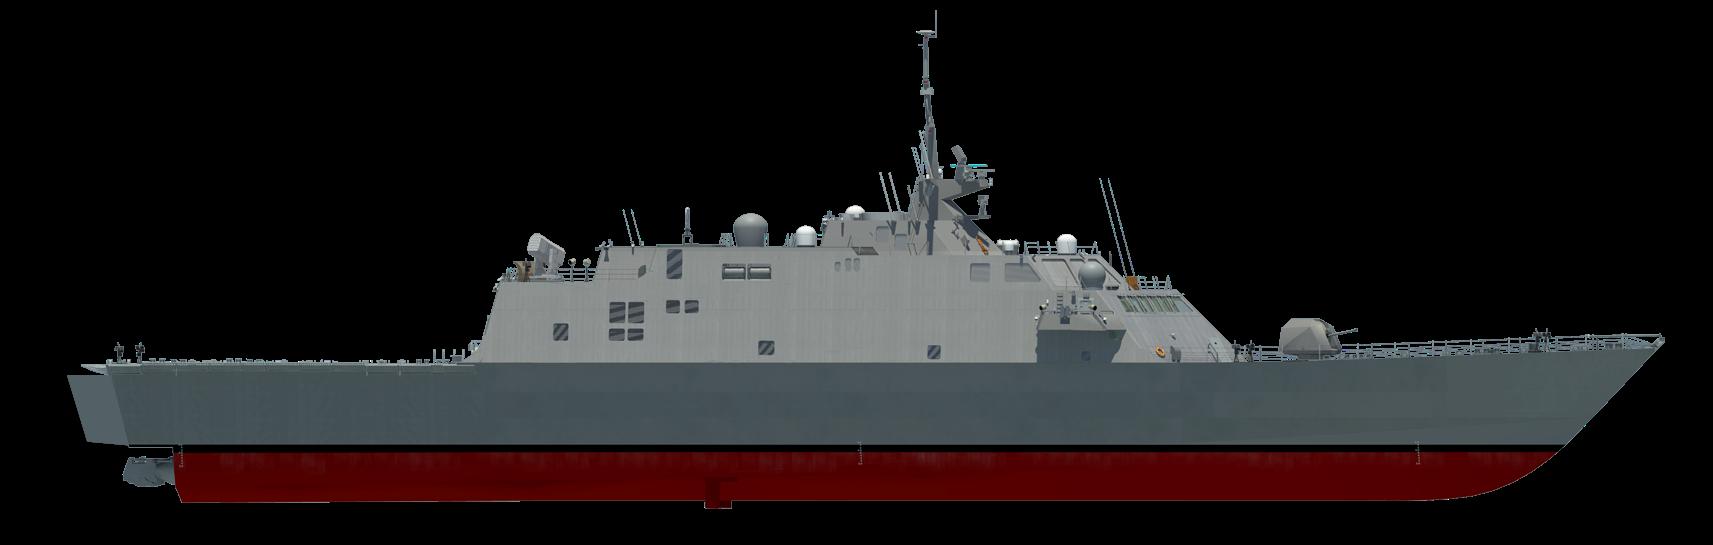 LCS-1 FREEDOM-KlasseGrafik: U.S. Navy